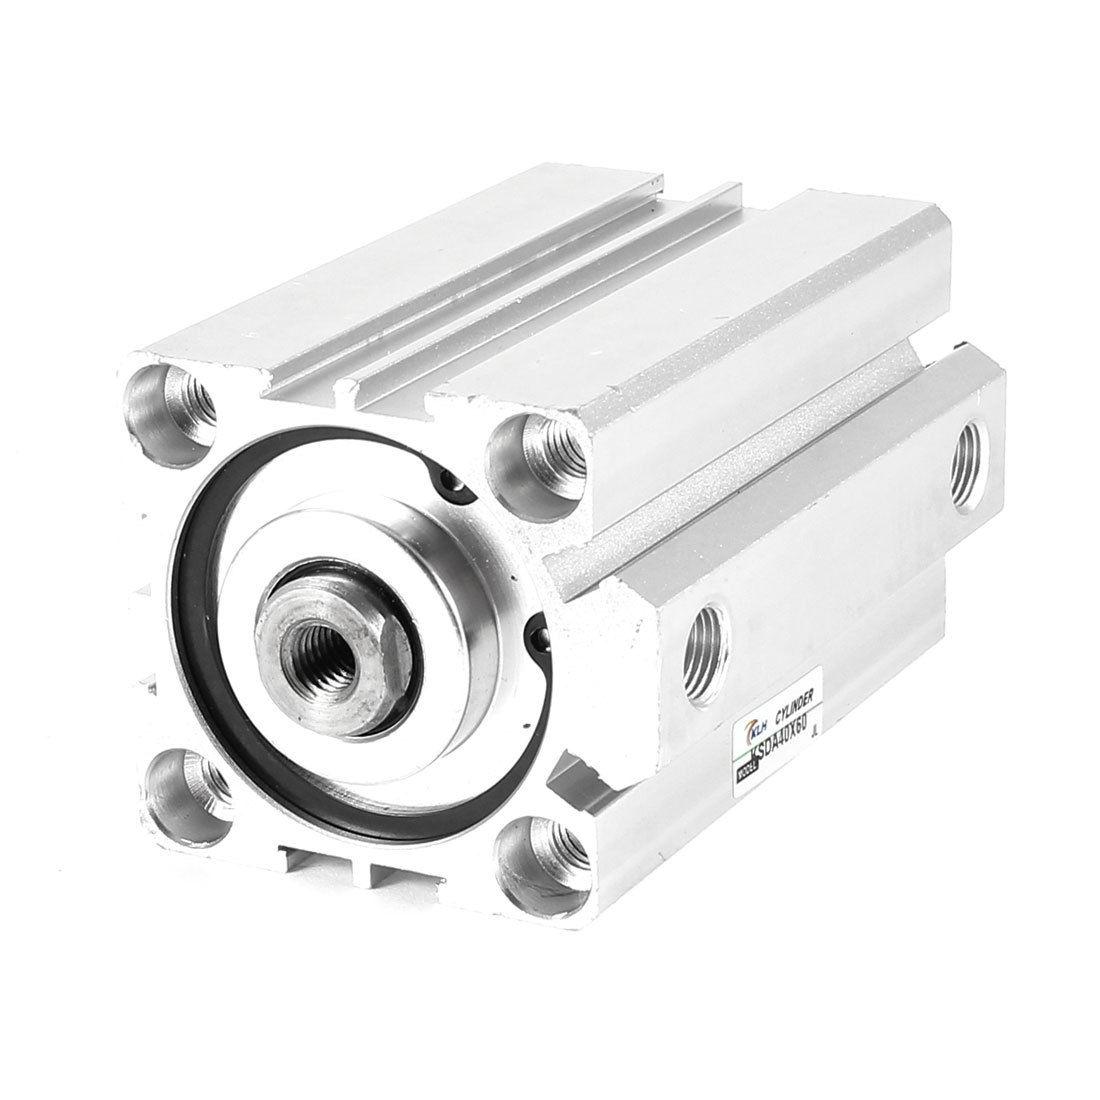 1 Pcs 63mm Bore 80mm Stroke Stainless steel Pneumatic Air Cylinder SDA63-80 1 pcs 32mm bore 75mm stroke stainless steel pneumatic air cylinder m32x75